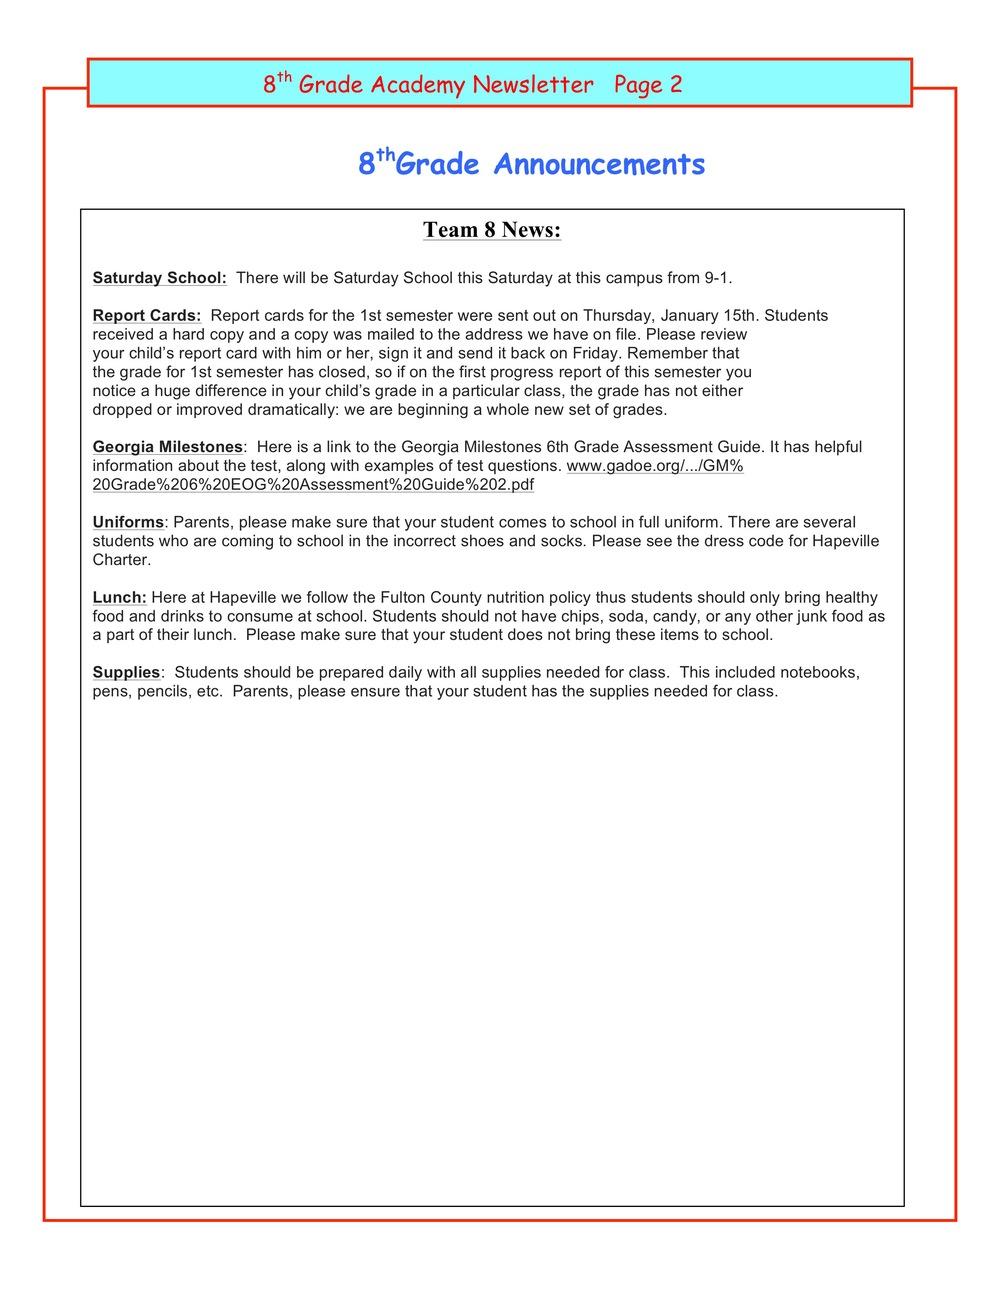 Newsletter Image8th grade Jan 20-23 2.jpeg